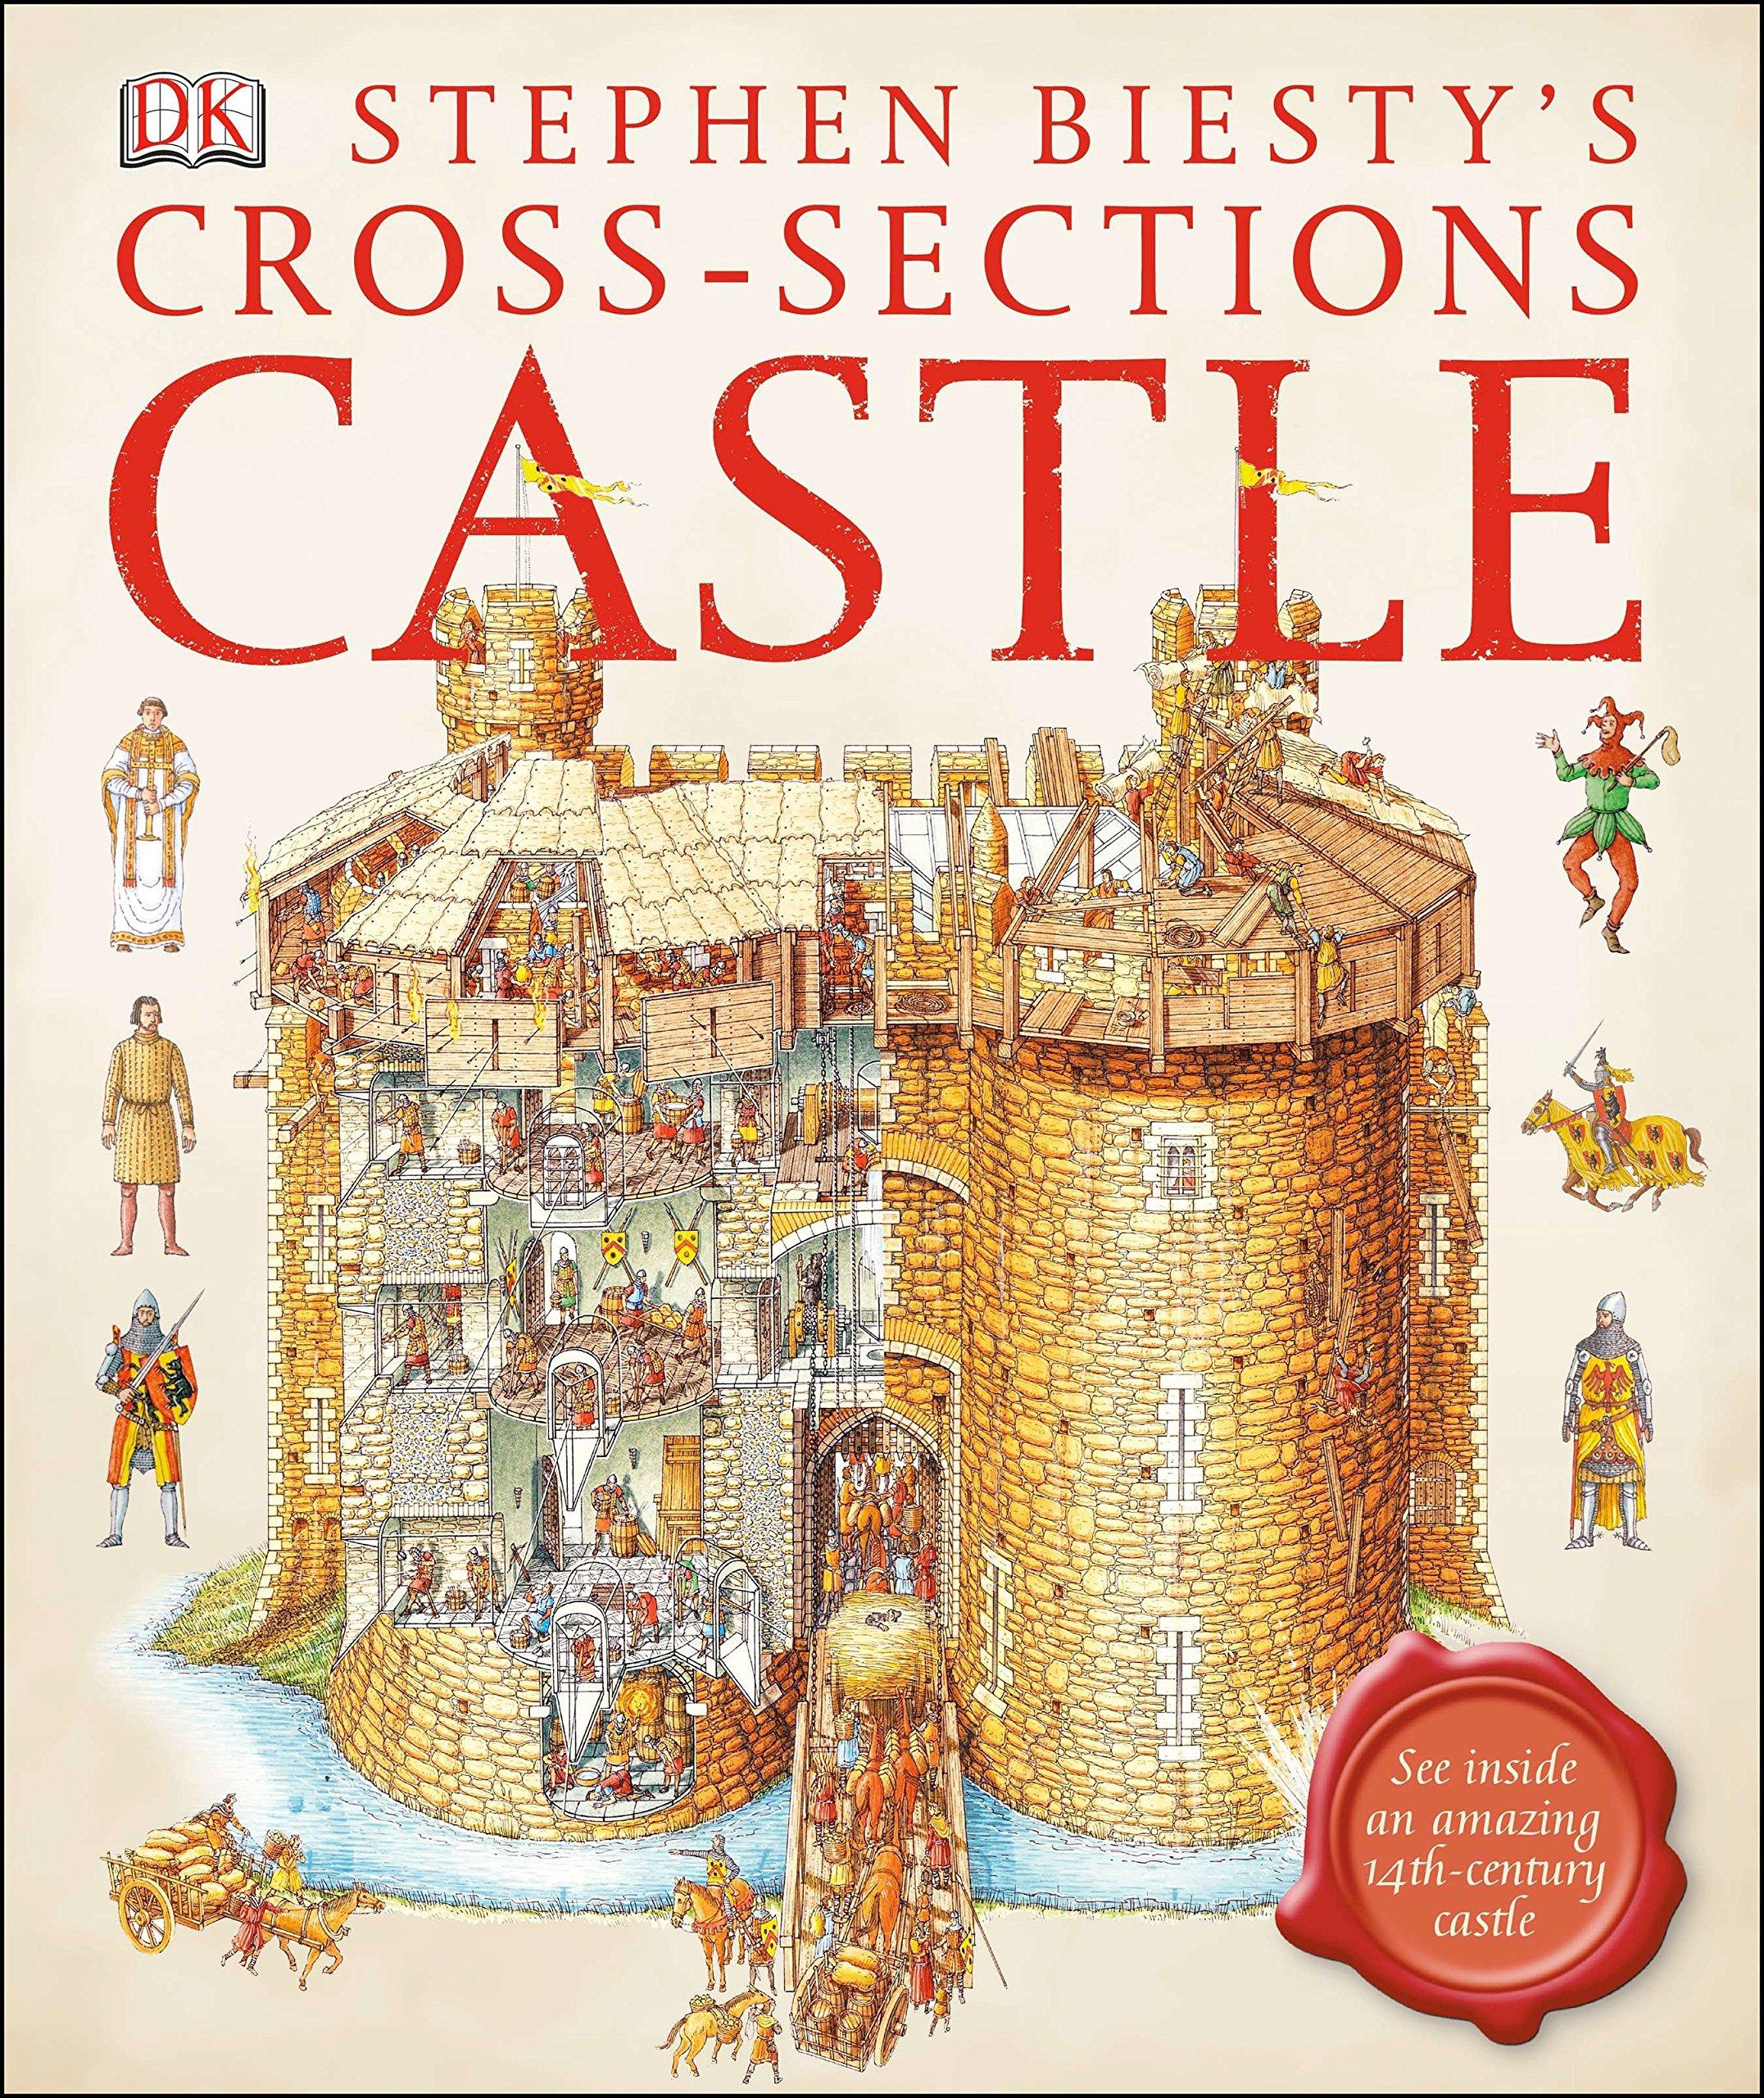 Stephen Biesty's Cross-sections Castle: See Inside an Amazing 14th-Century Castle